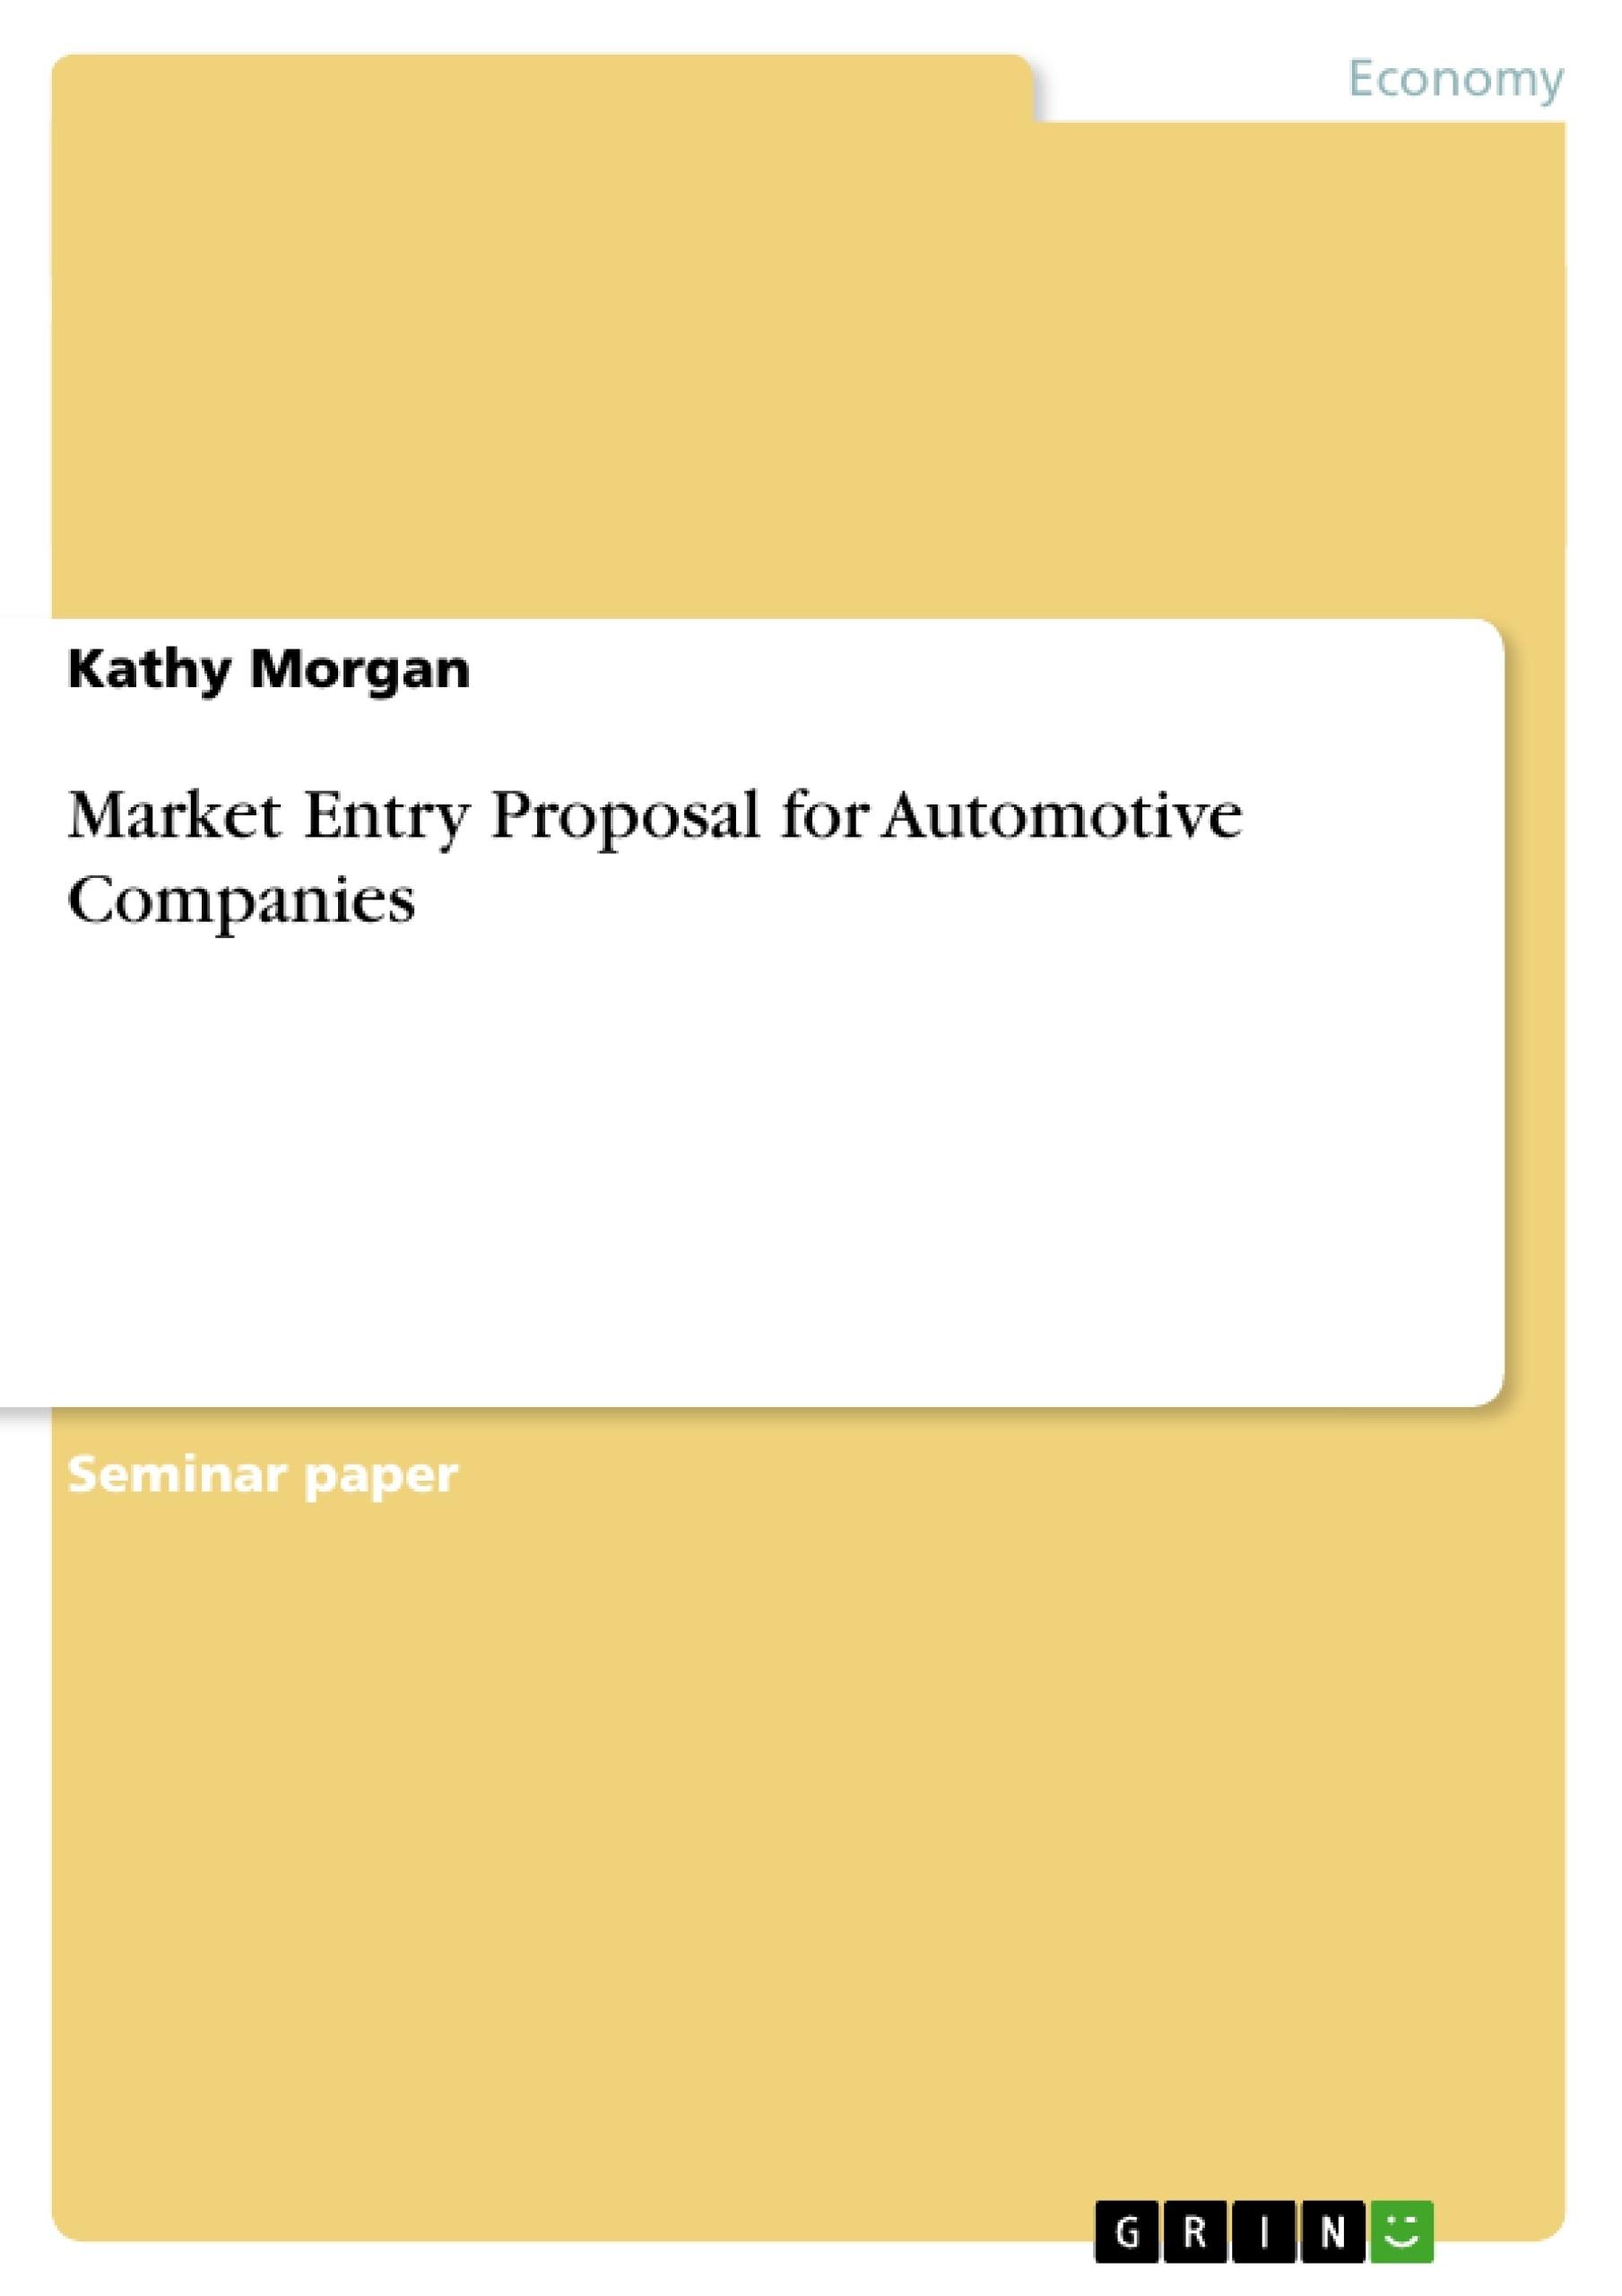 Title: Market Entry Proposal for Automotive Companies